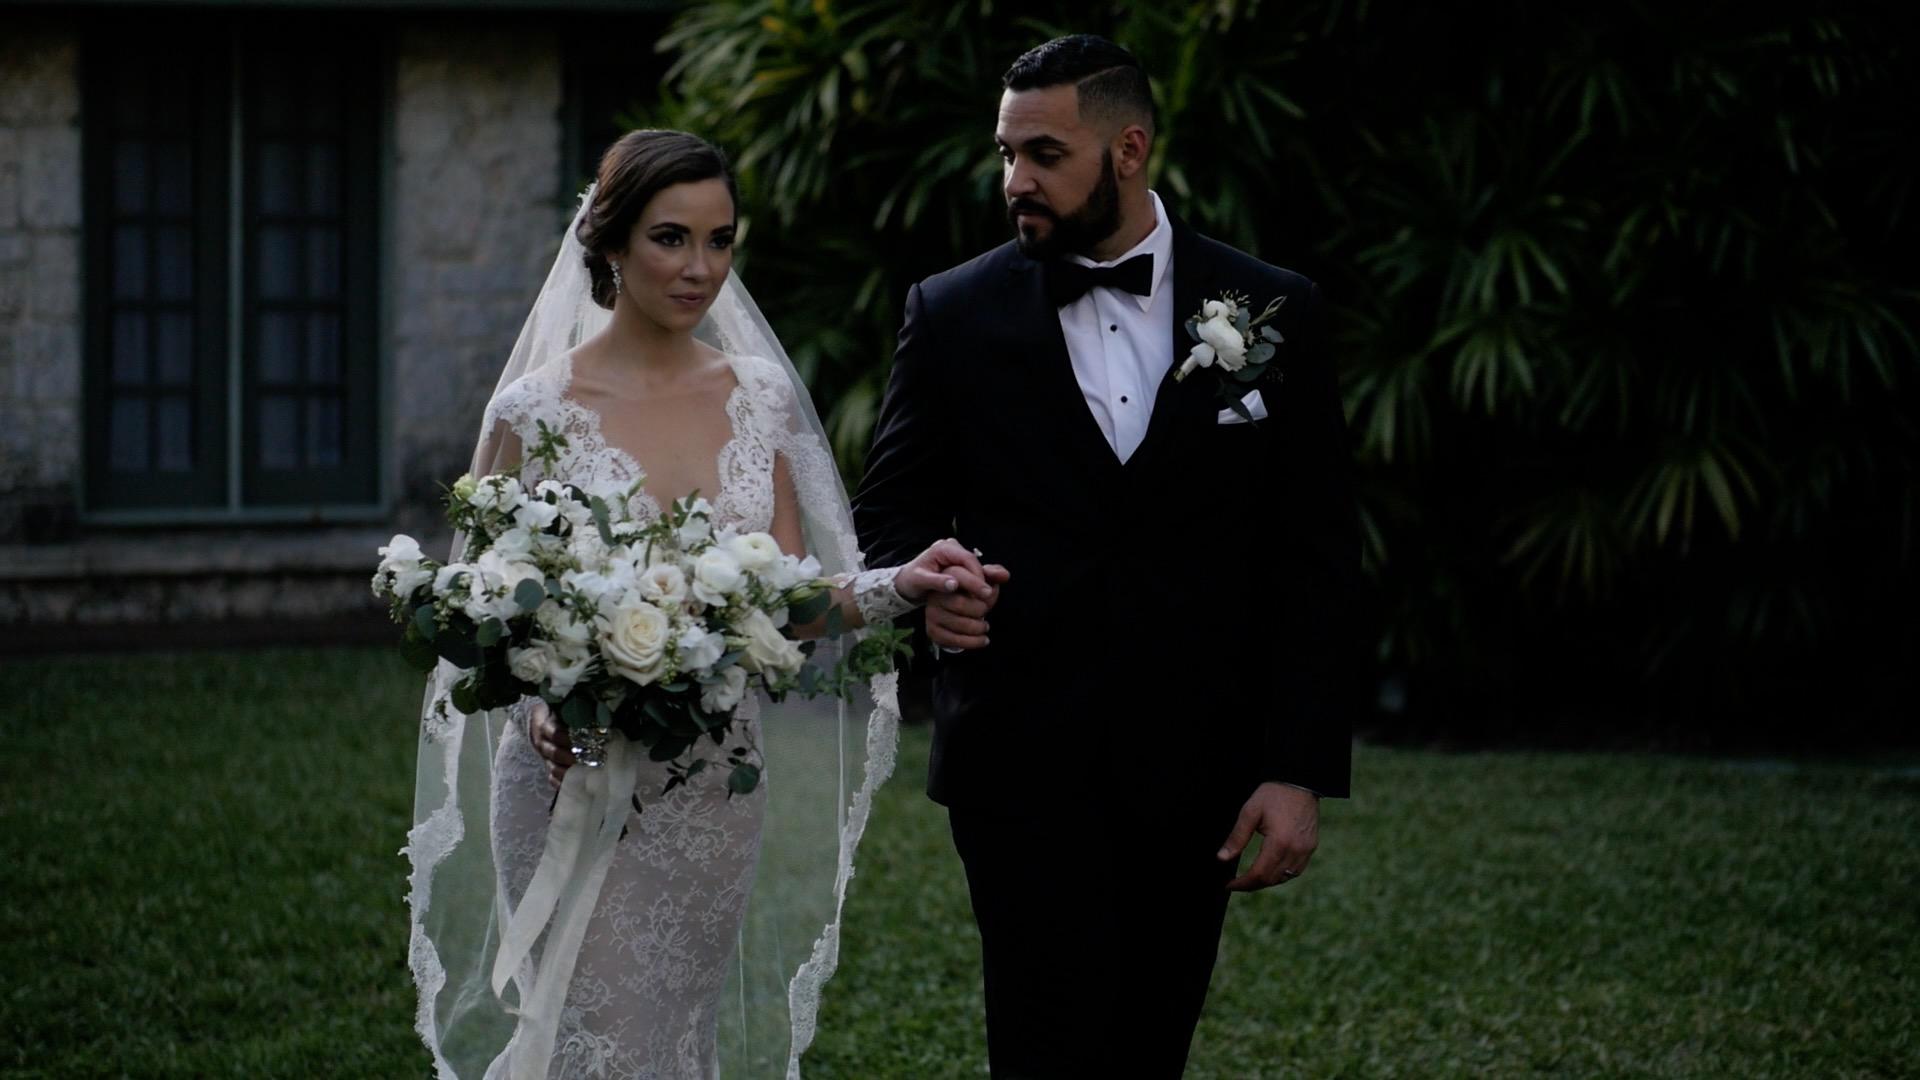 The Cooper Estate wedding